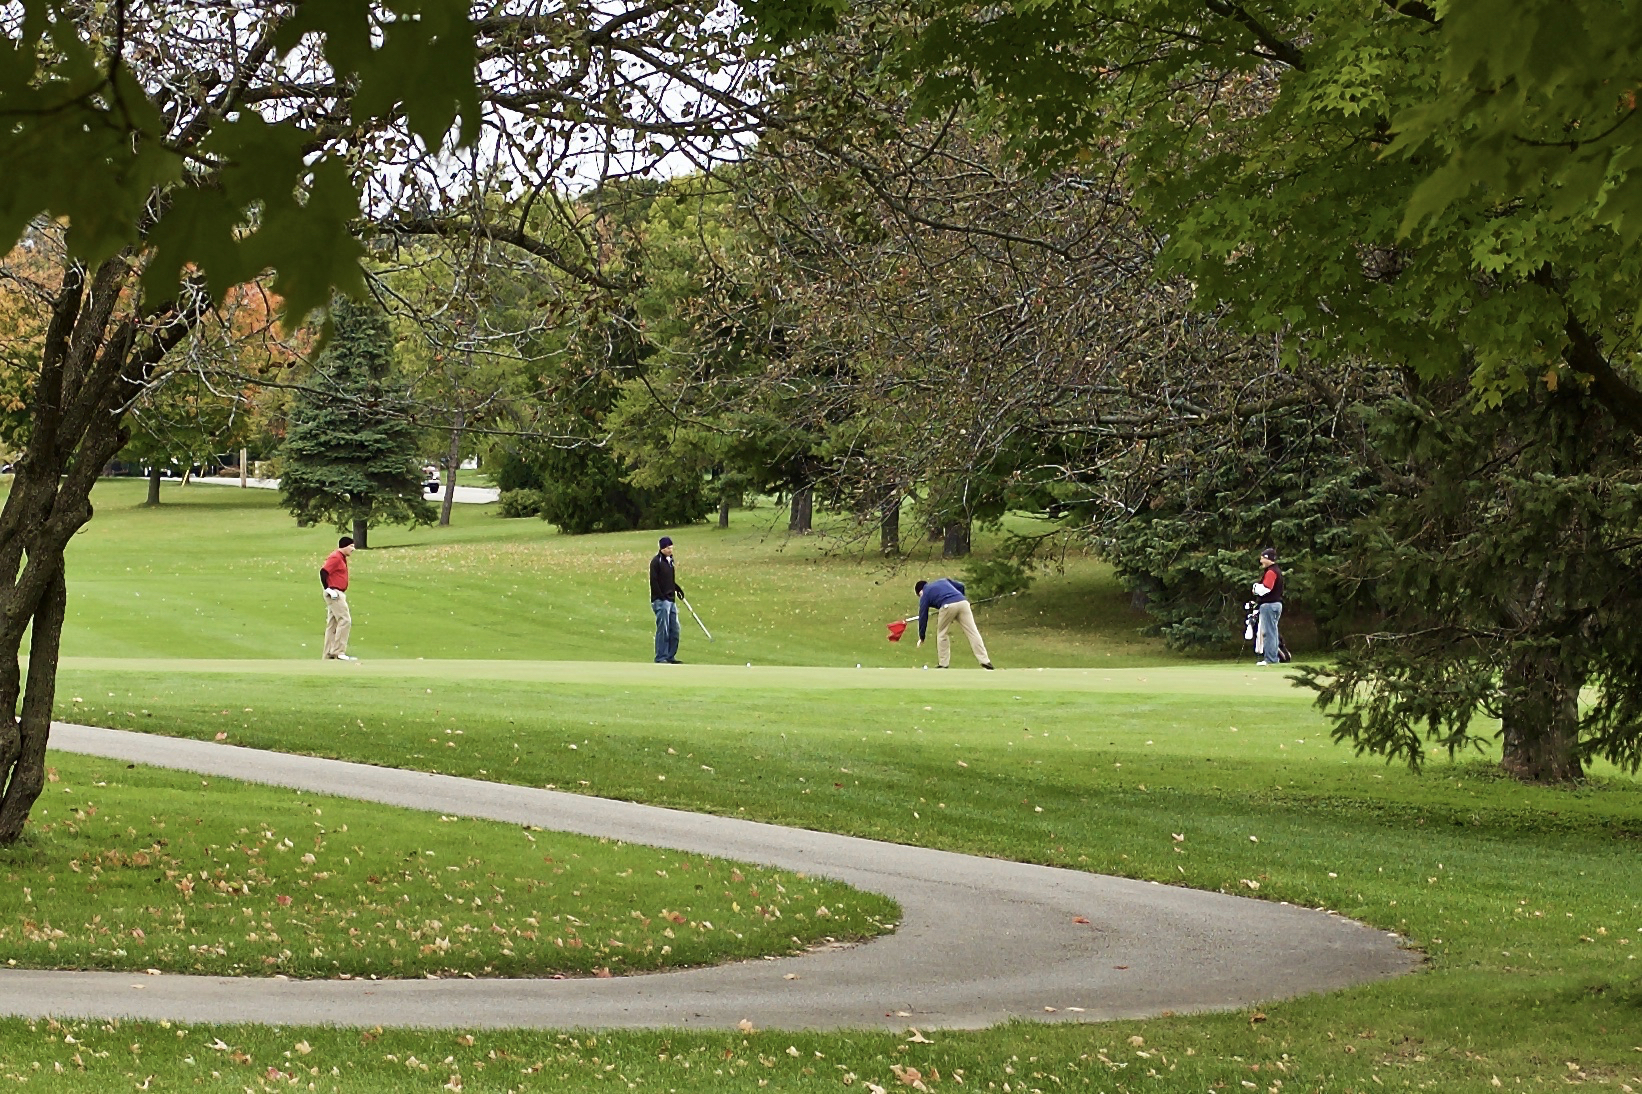 Fall Golf. Odana Hills. Madison, Wisconsin. October 2015. © William D. Walker